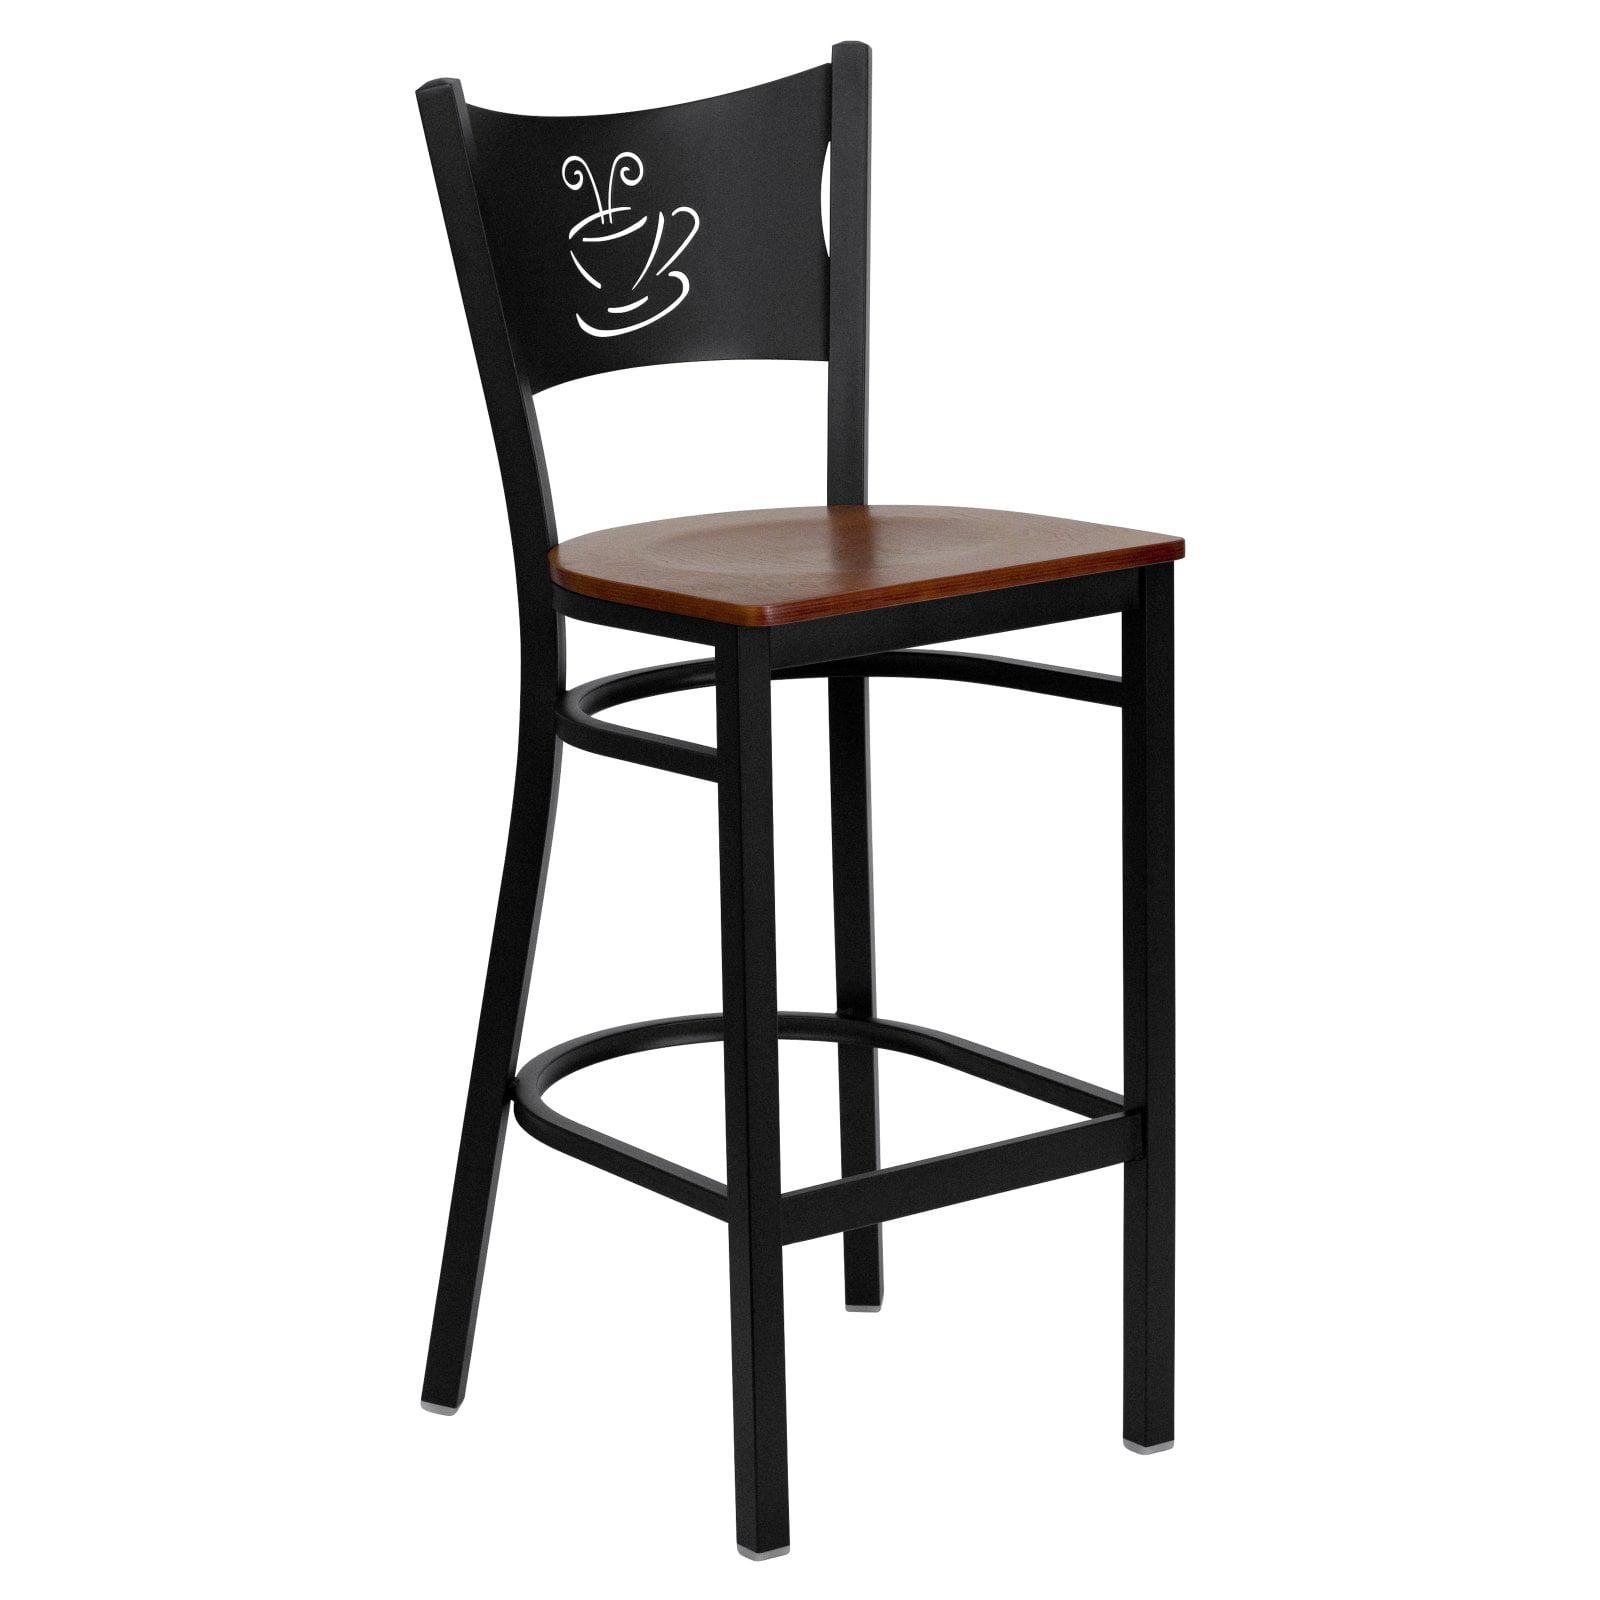 Flash Furniture HERCULES Series Black Coffee Back Metal Restaurant Barstool, Wood Seat, Multiple Colors